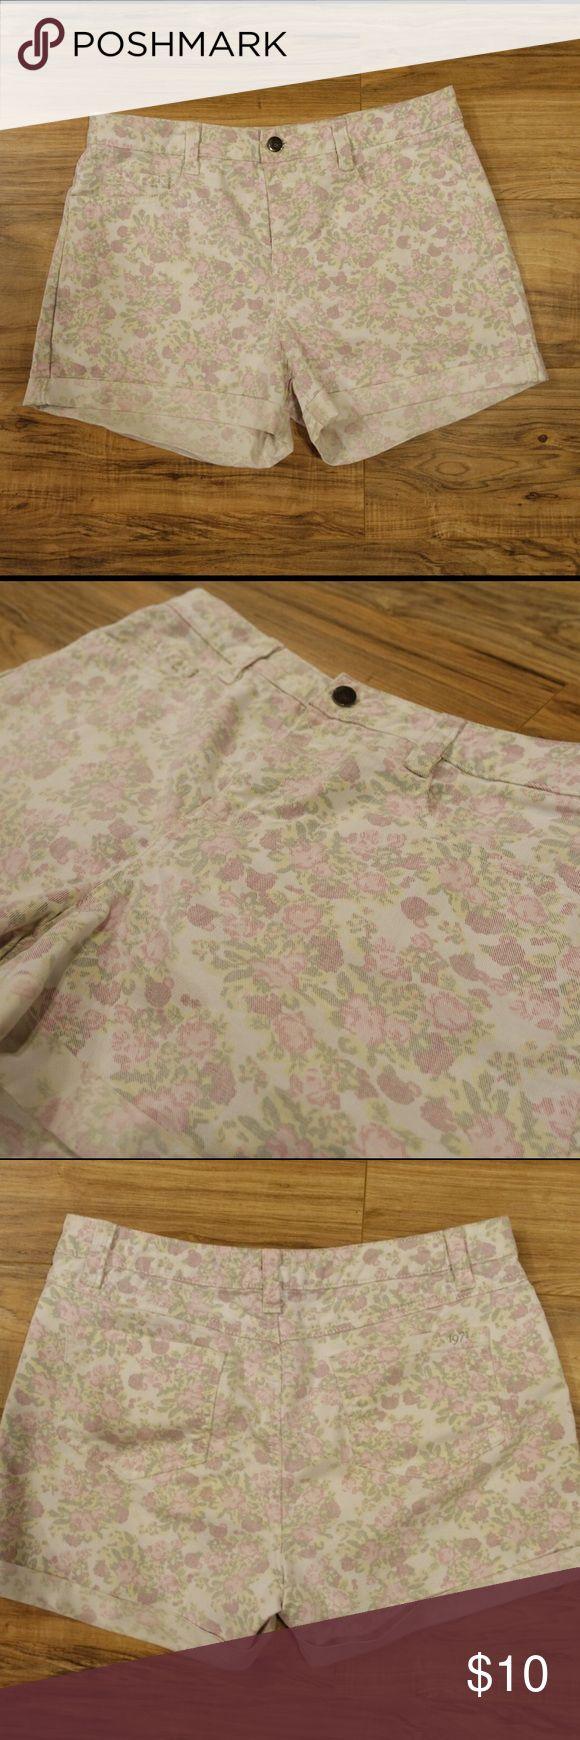 Floral denim shorts EUC! Adorable floral high waisted shorts.   Waist 16.5 Rise 10.5 Inseam 3 Reiss Shorts